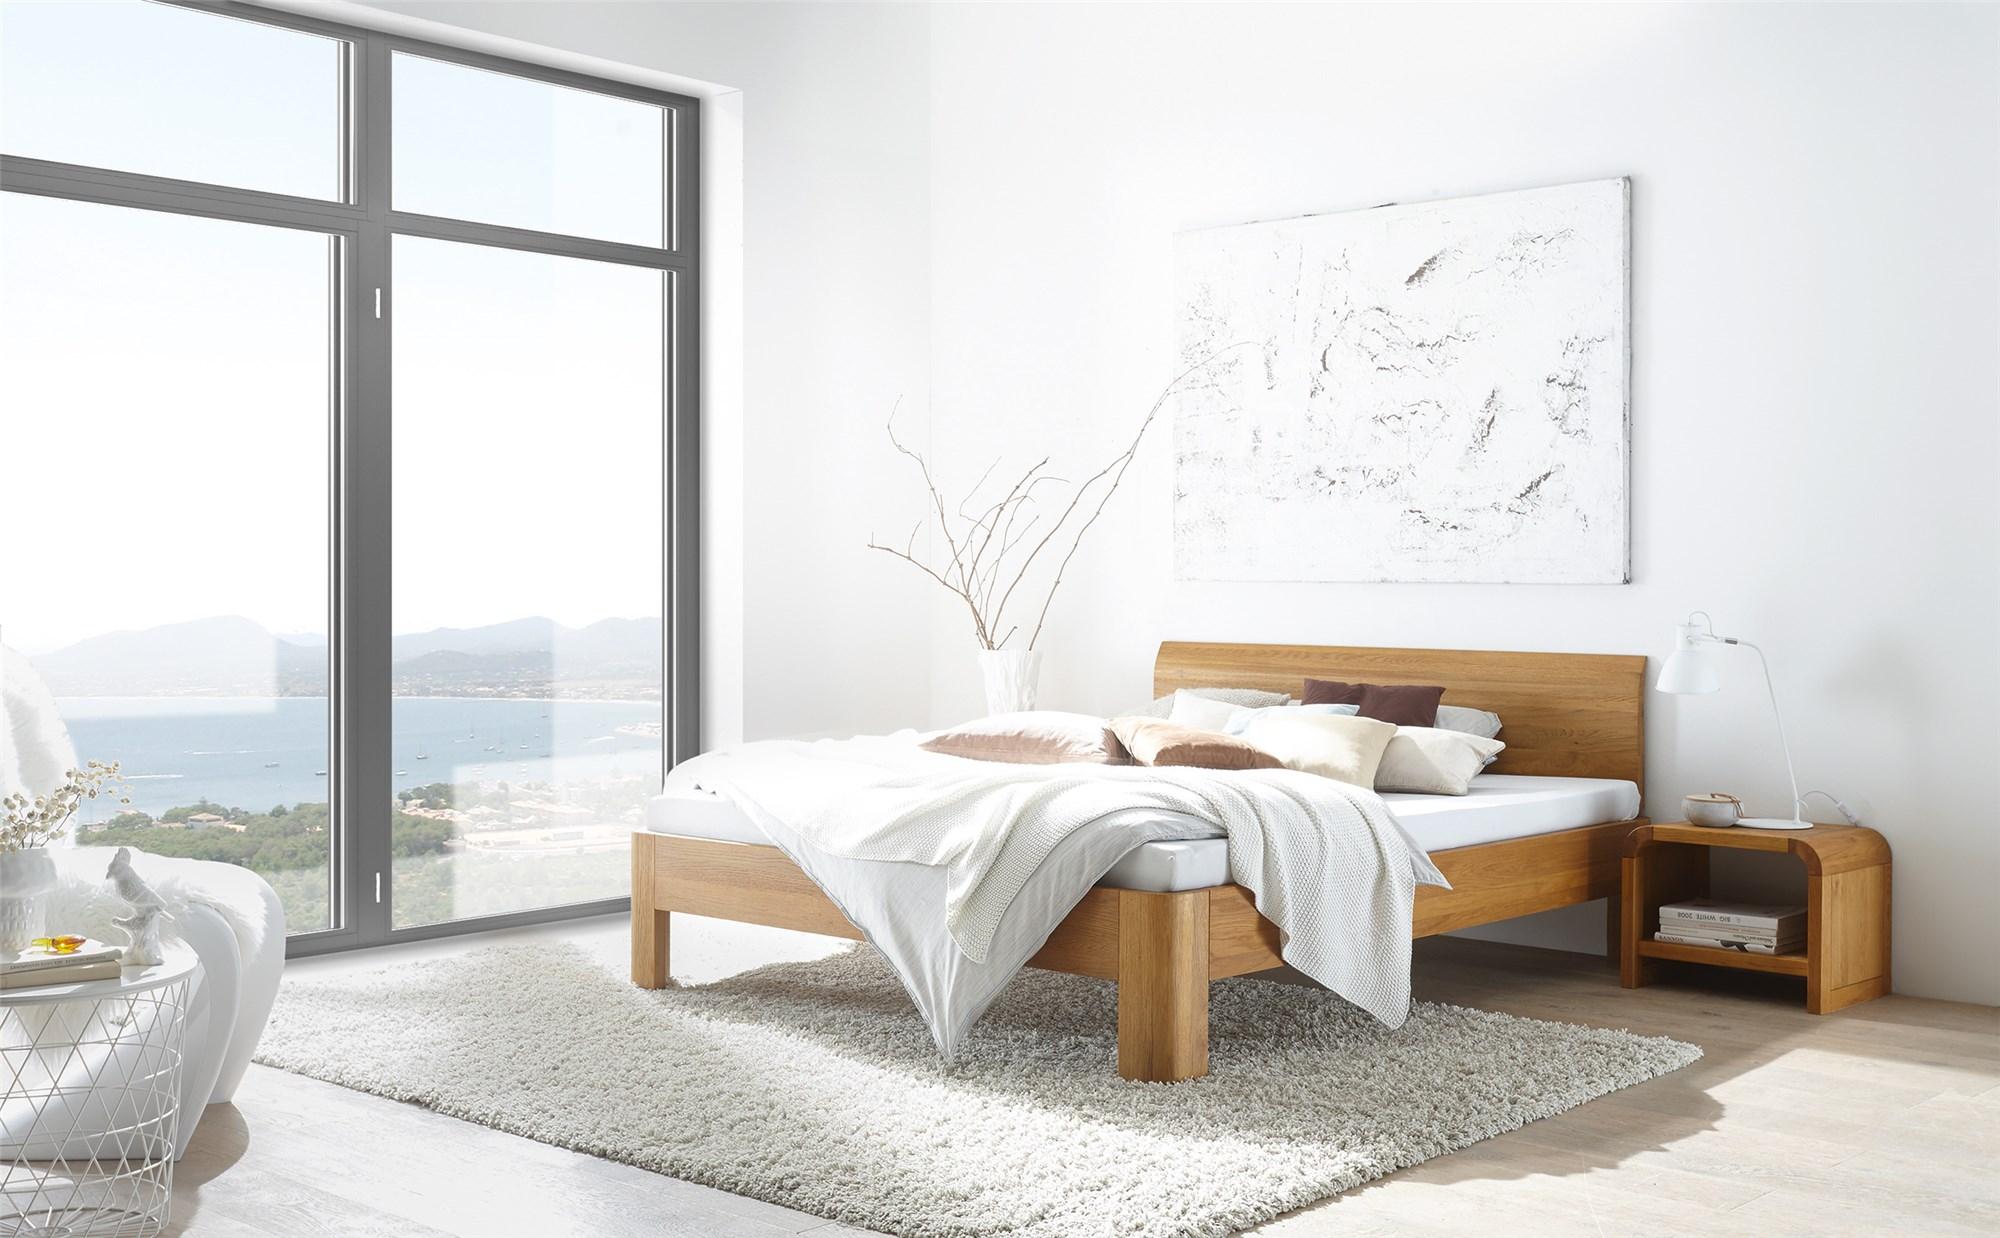 Dormitor lemn masiv BALI BRIGHT